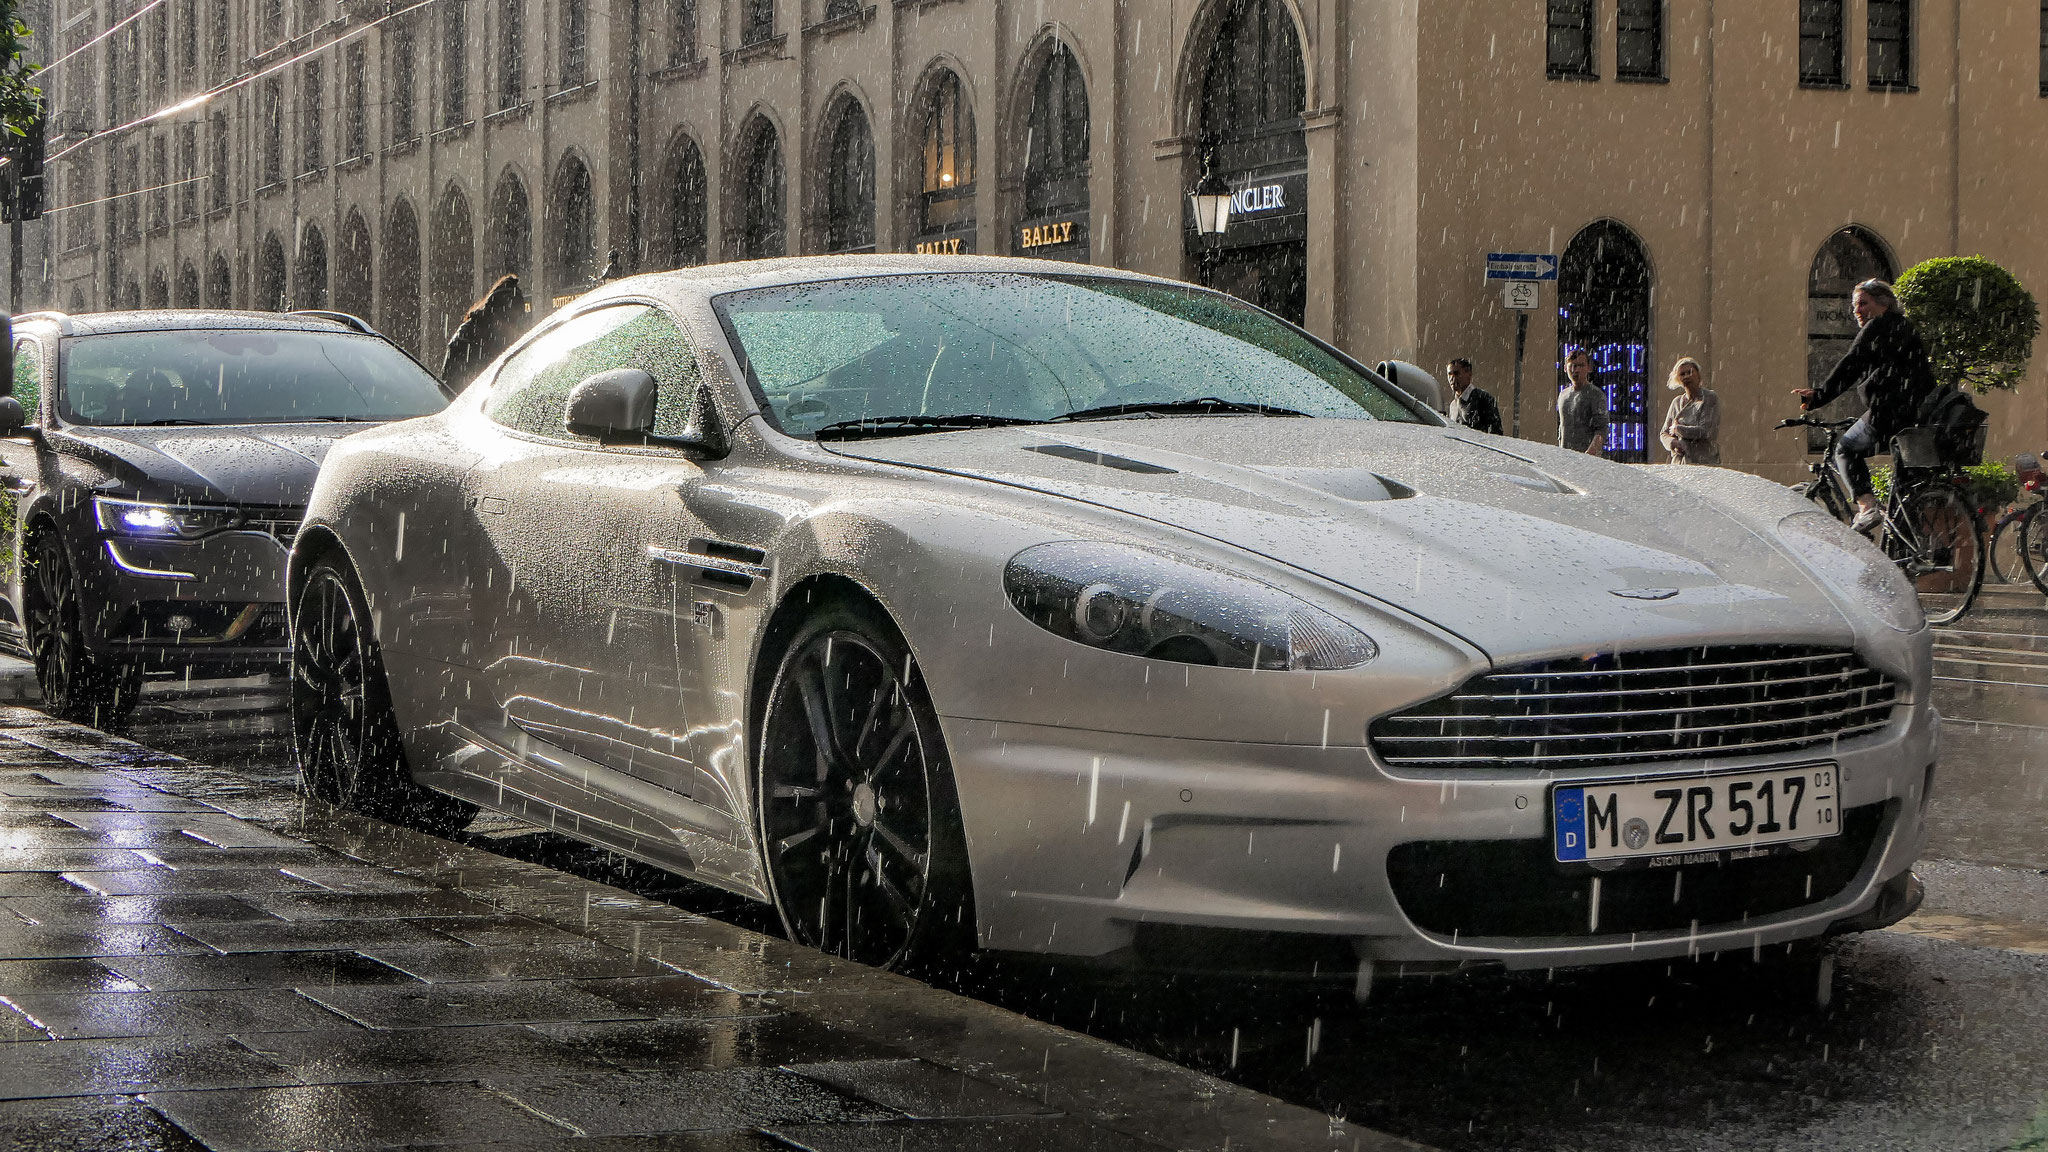 Aston Martin DBS - M-ZR-517